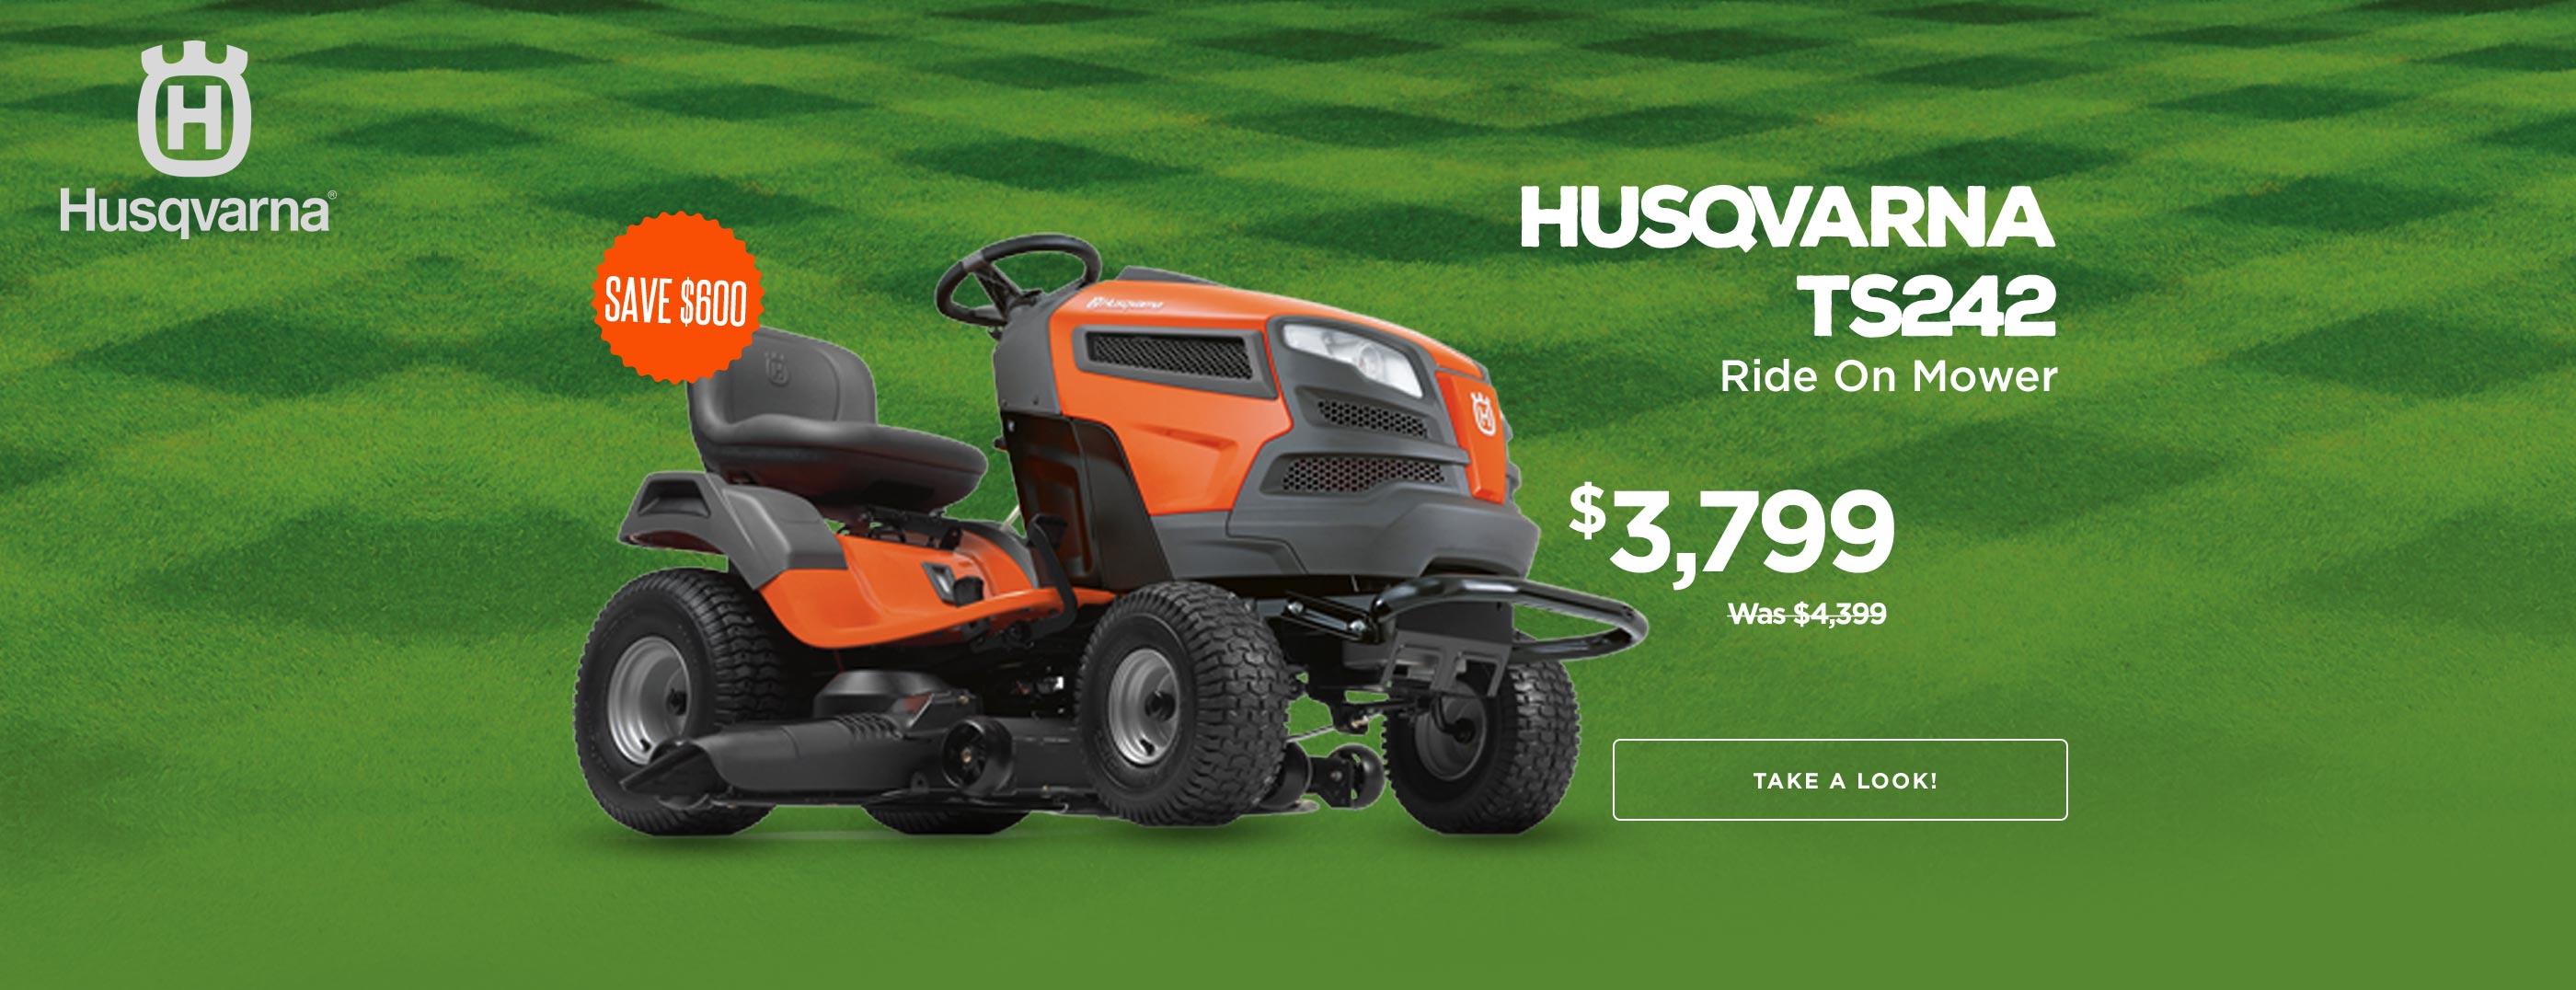 Husqvarna TS242 Huge $400 in Savings!